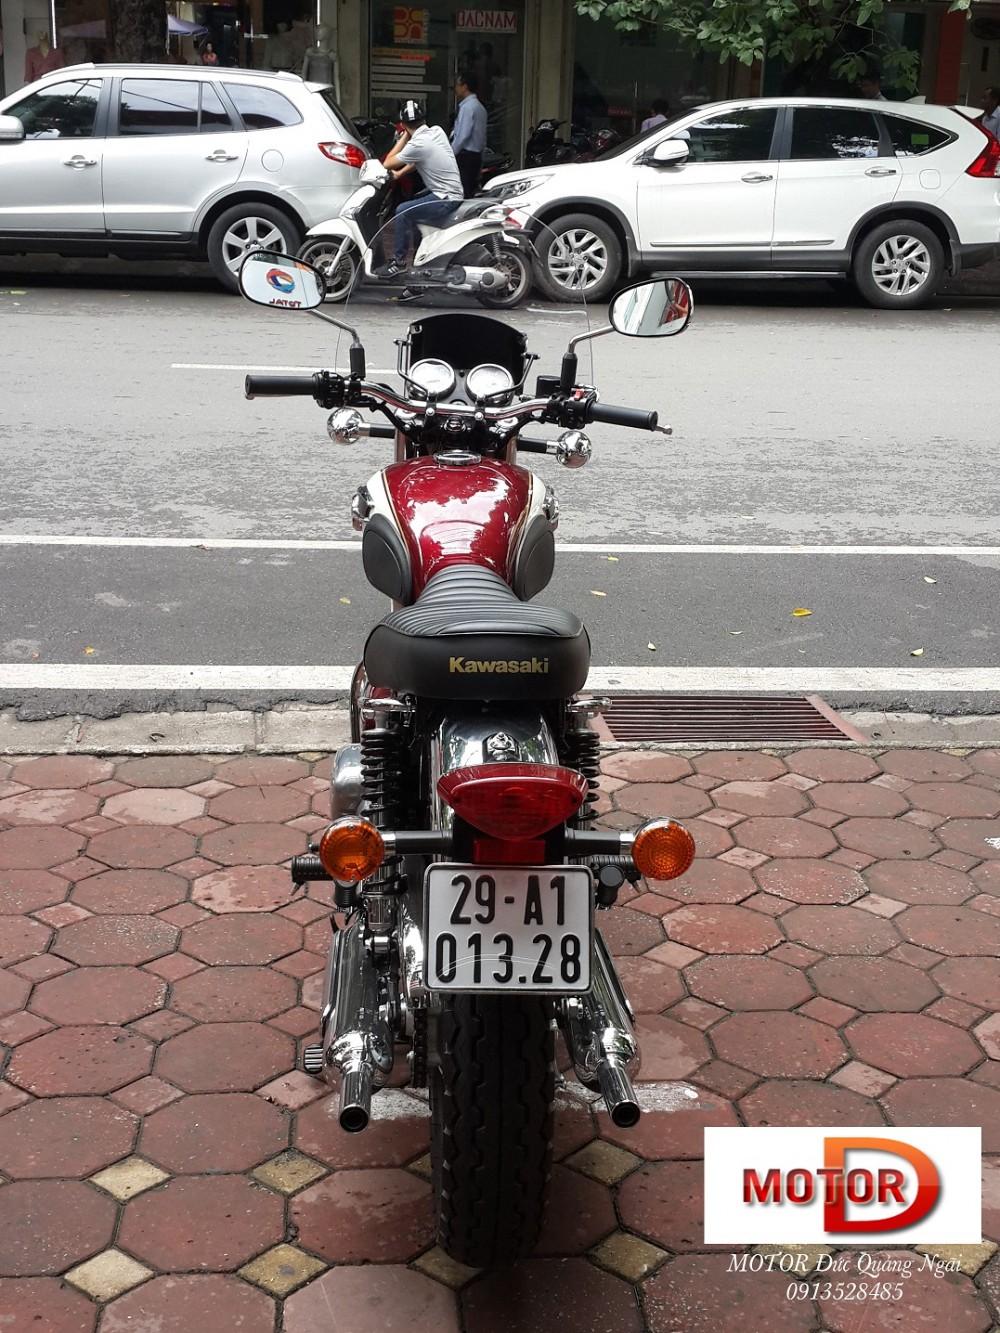 W800 KAWASAKI DUC QUANG NGAI - 2